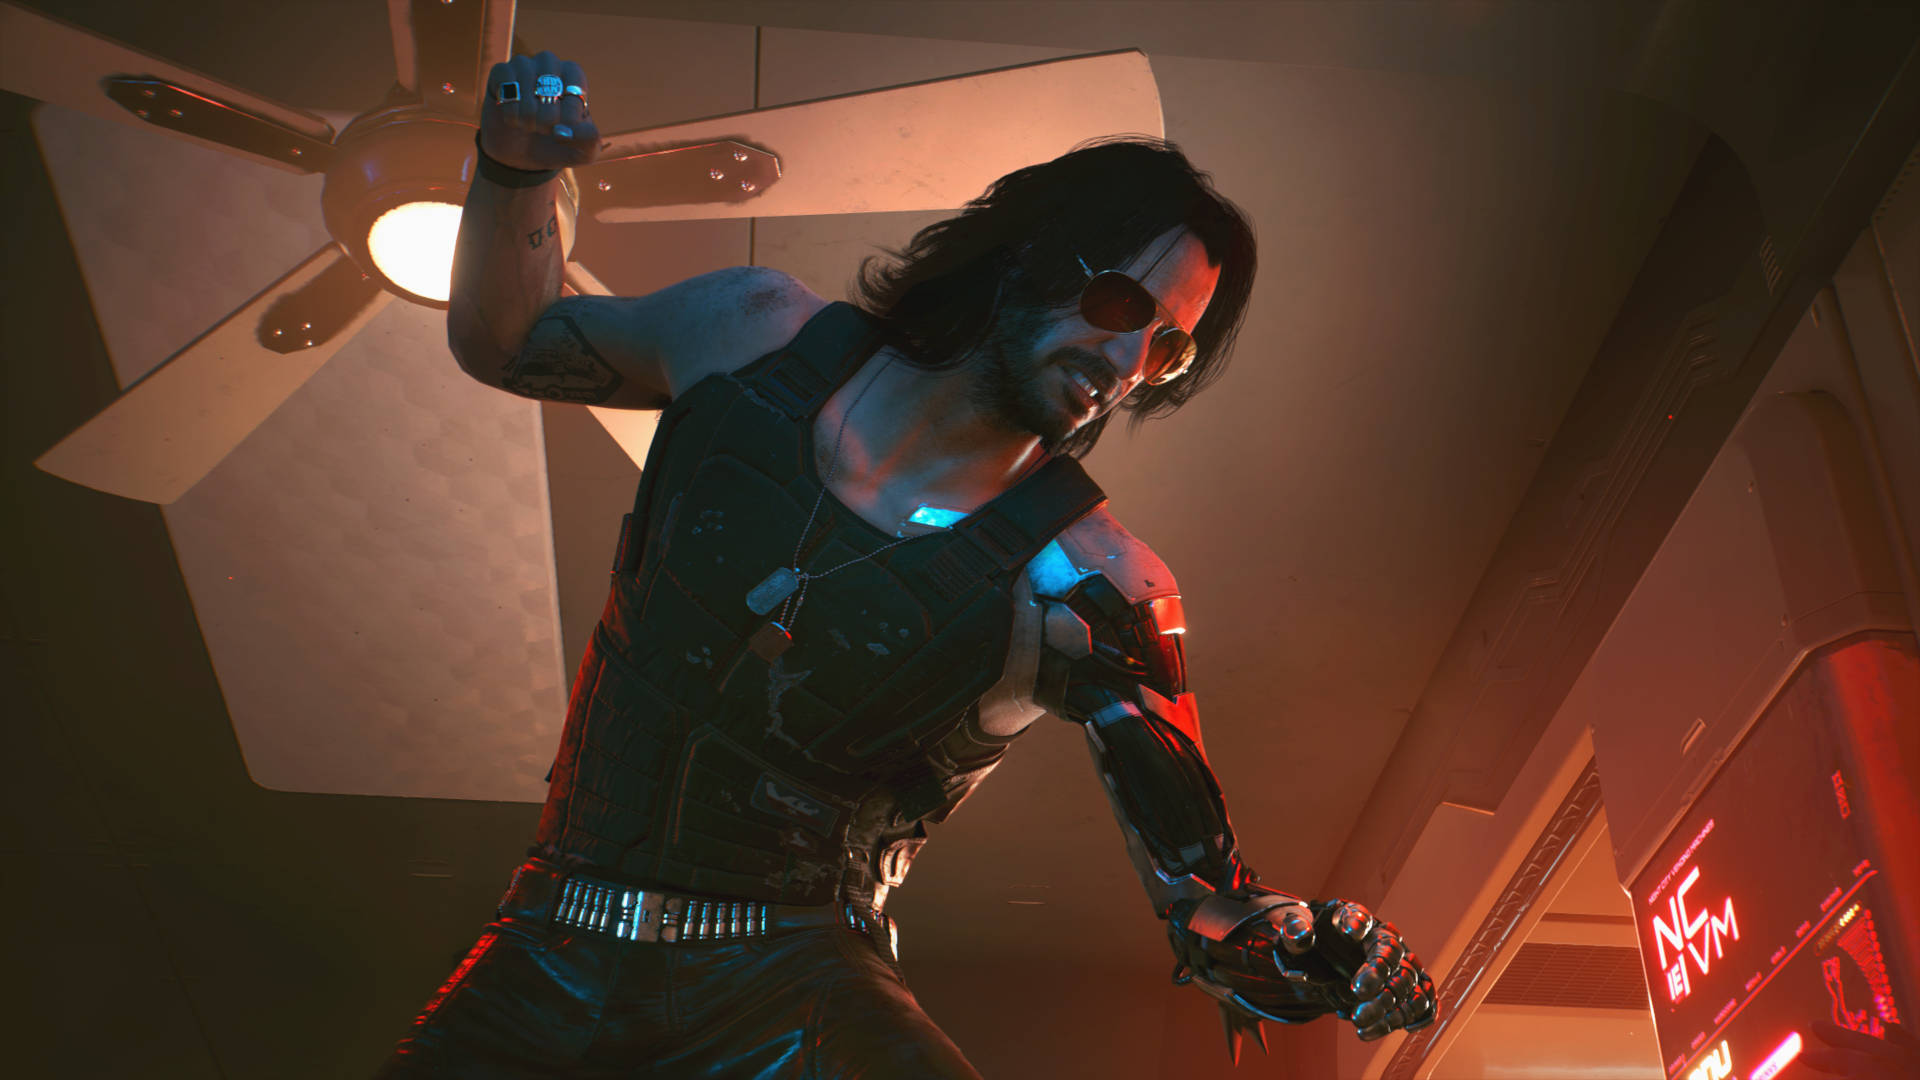 How to get Johnny Silverhand's pistol in Cyberpunk 2077